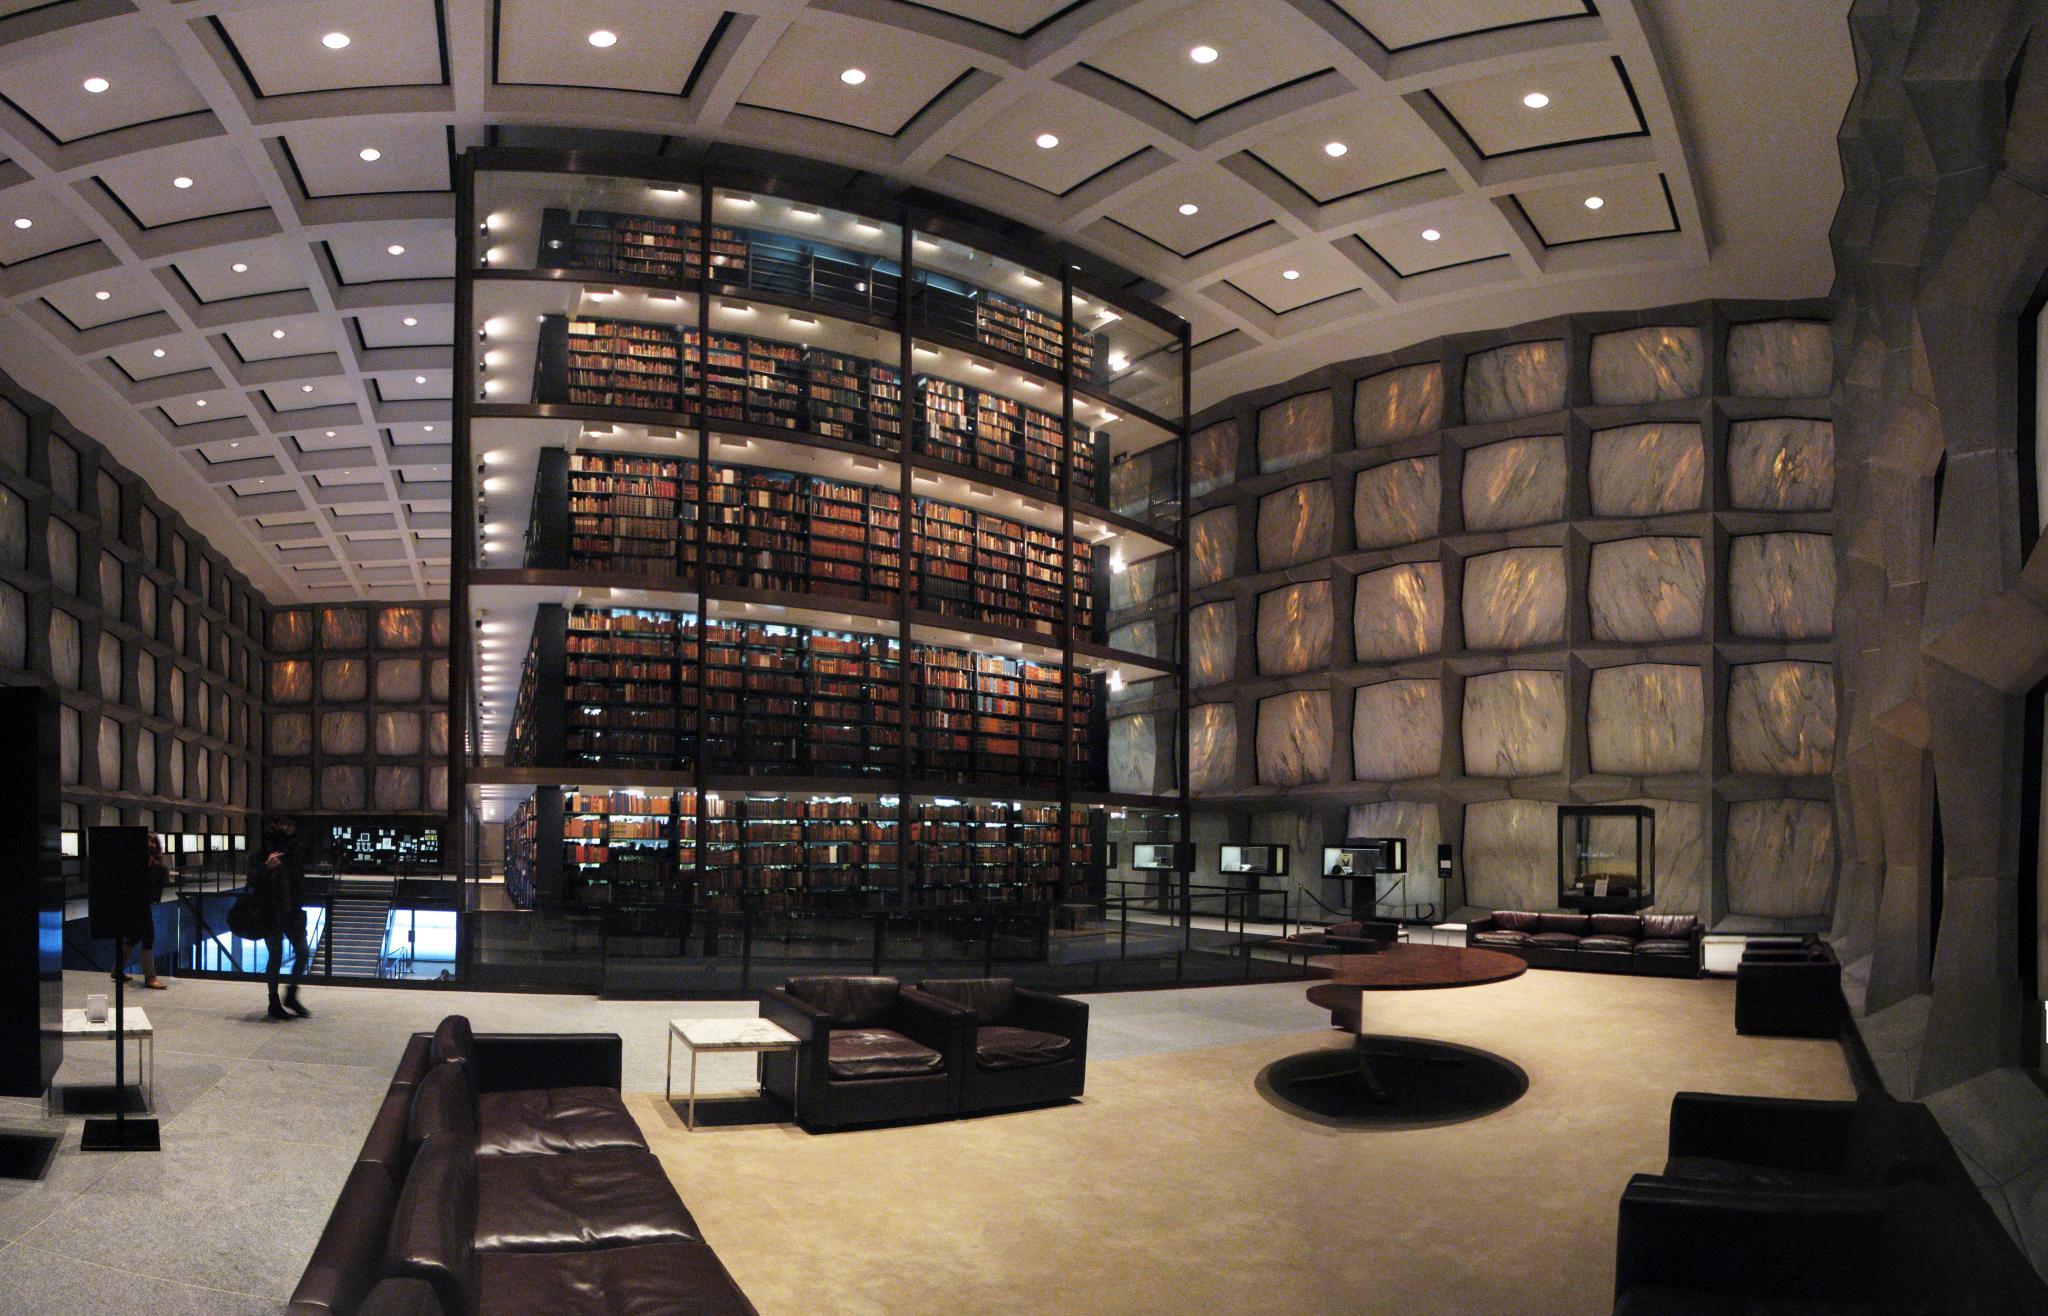 Beinecke Rare Book & Manuscript Library, Yale University, Connecticut, Usa